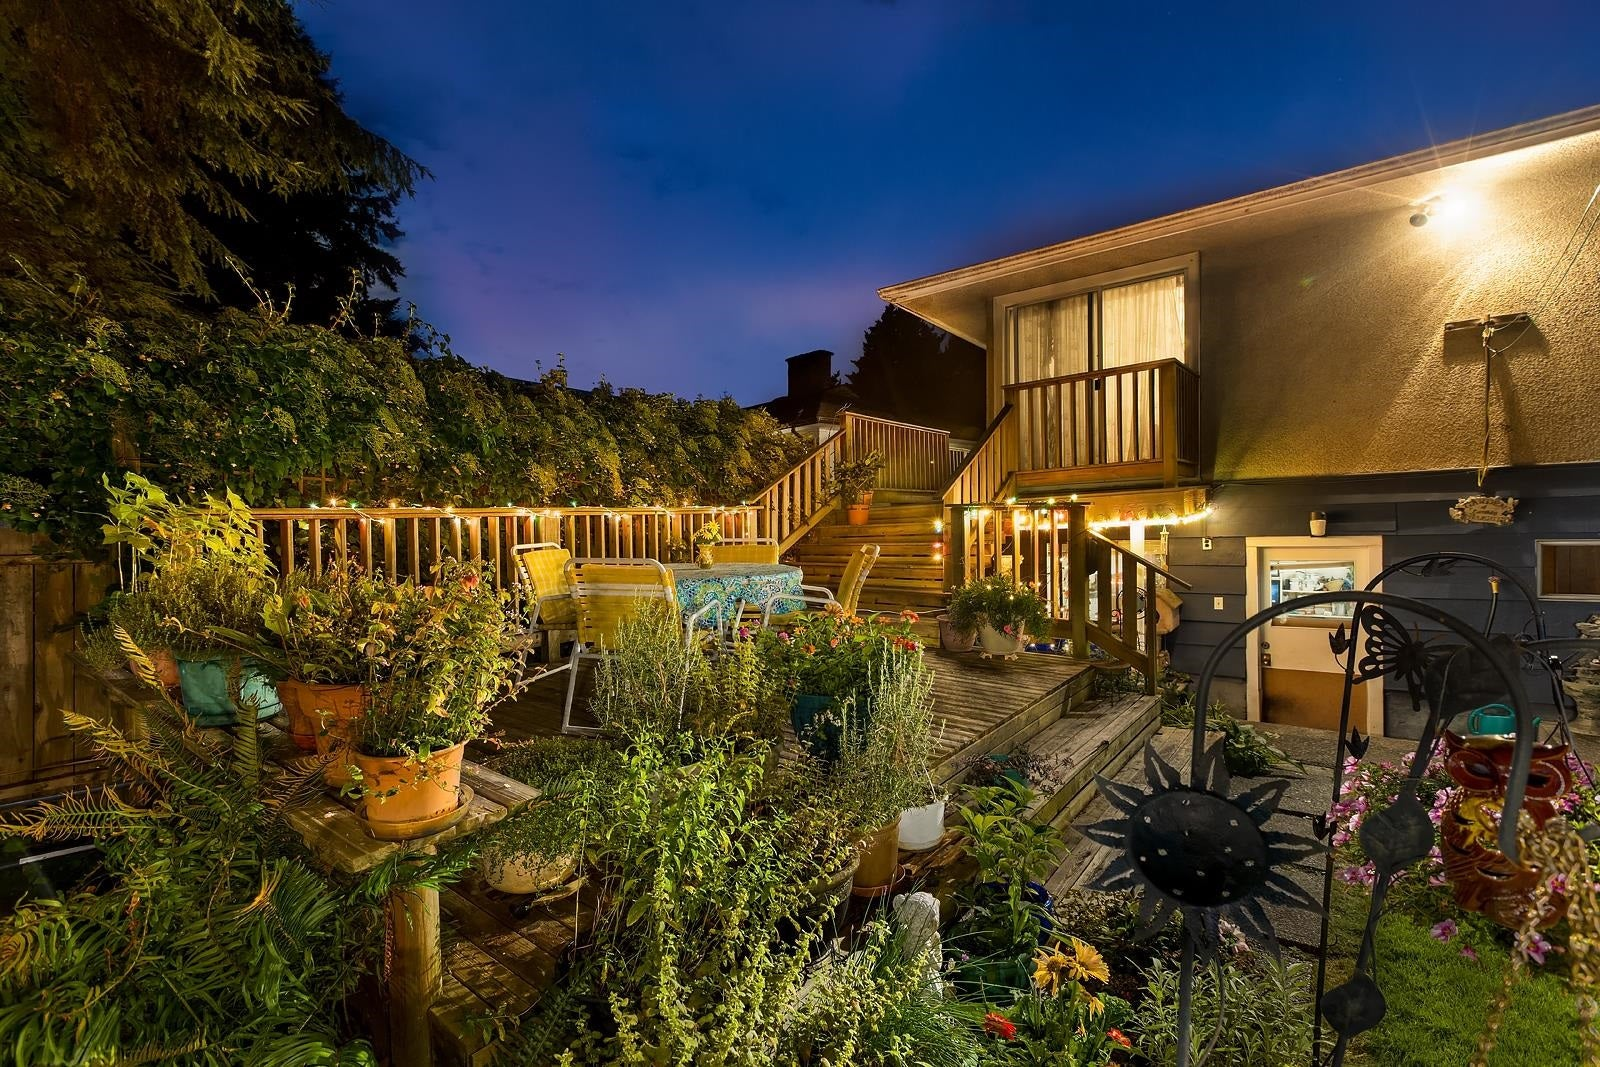 3495 WELLINGTON CRESCENT - Edgemont House/Single Family for sale, 3 Bedrooms (R2617949) - #14